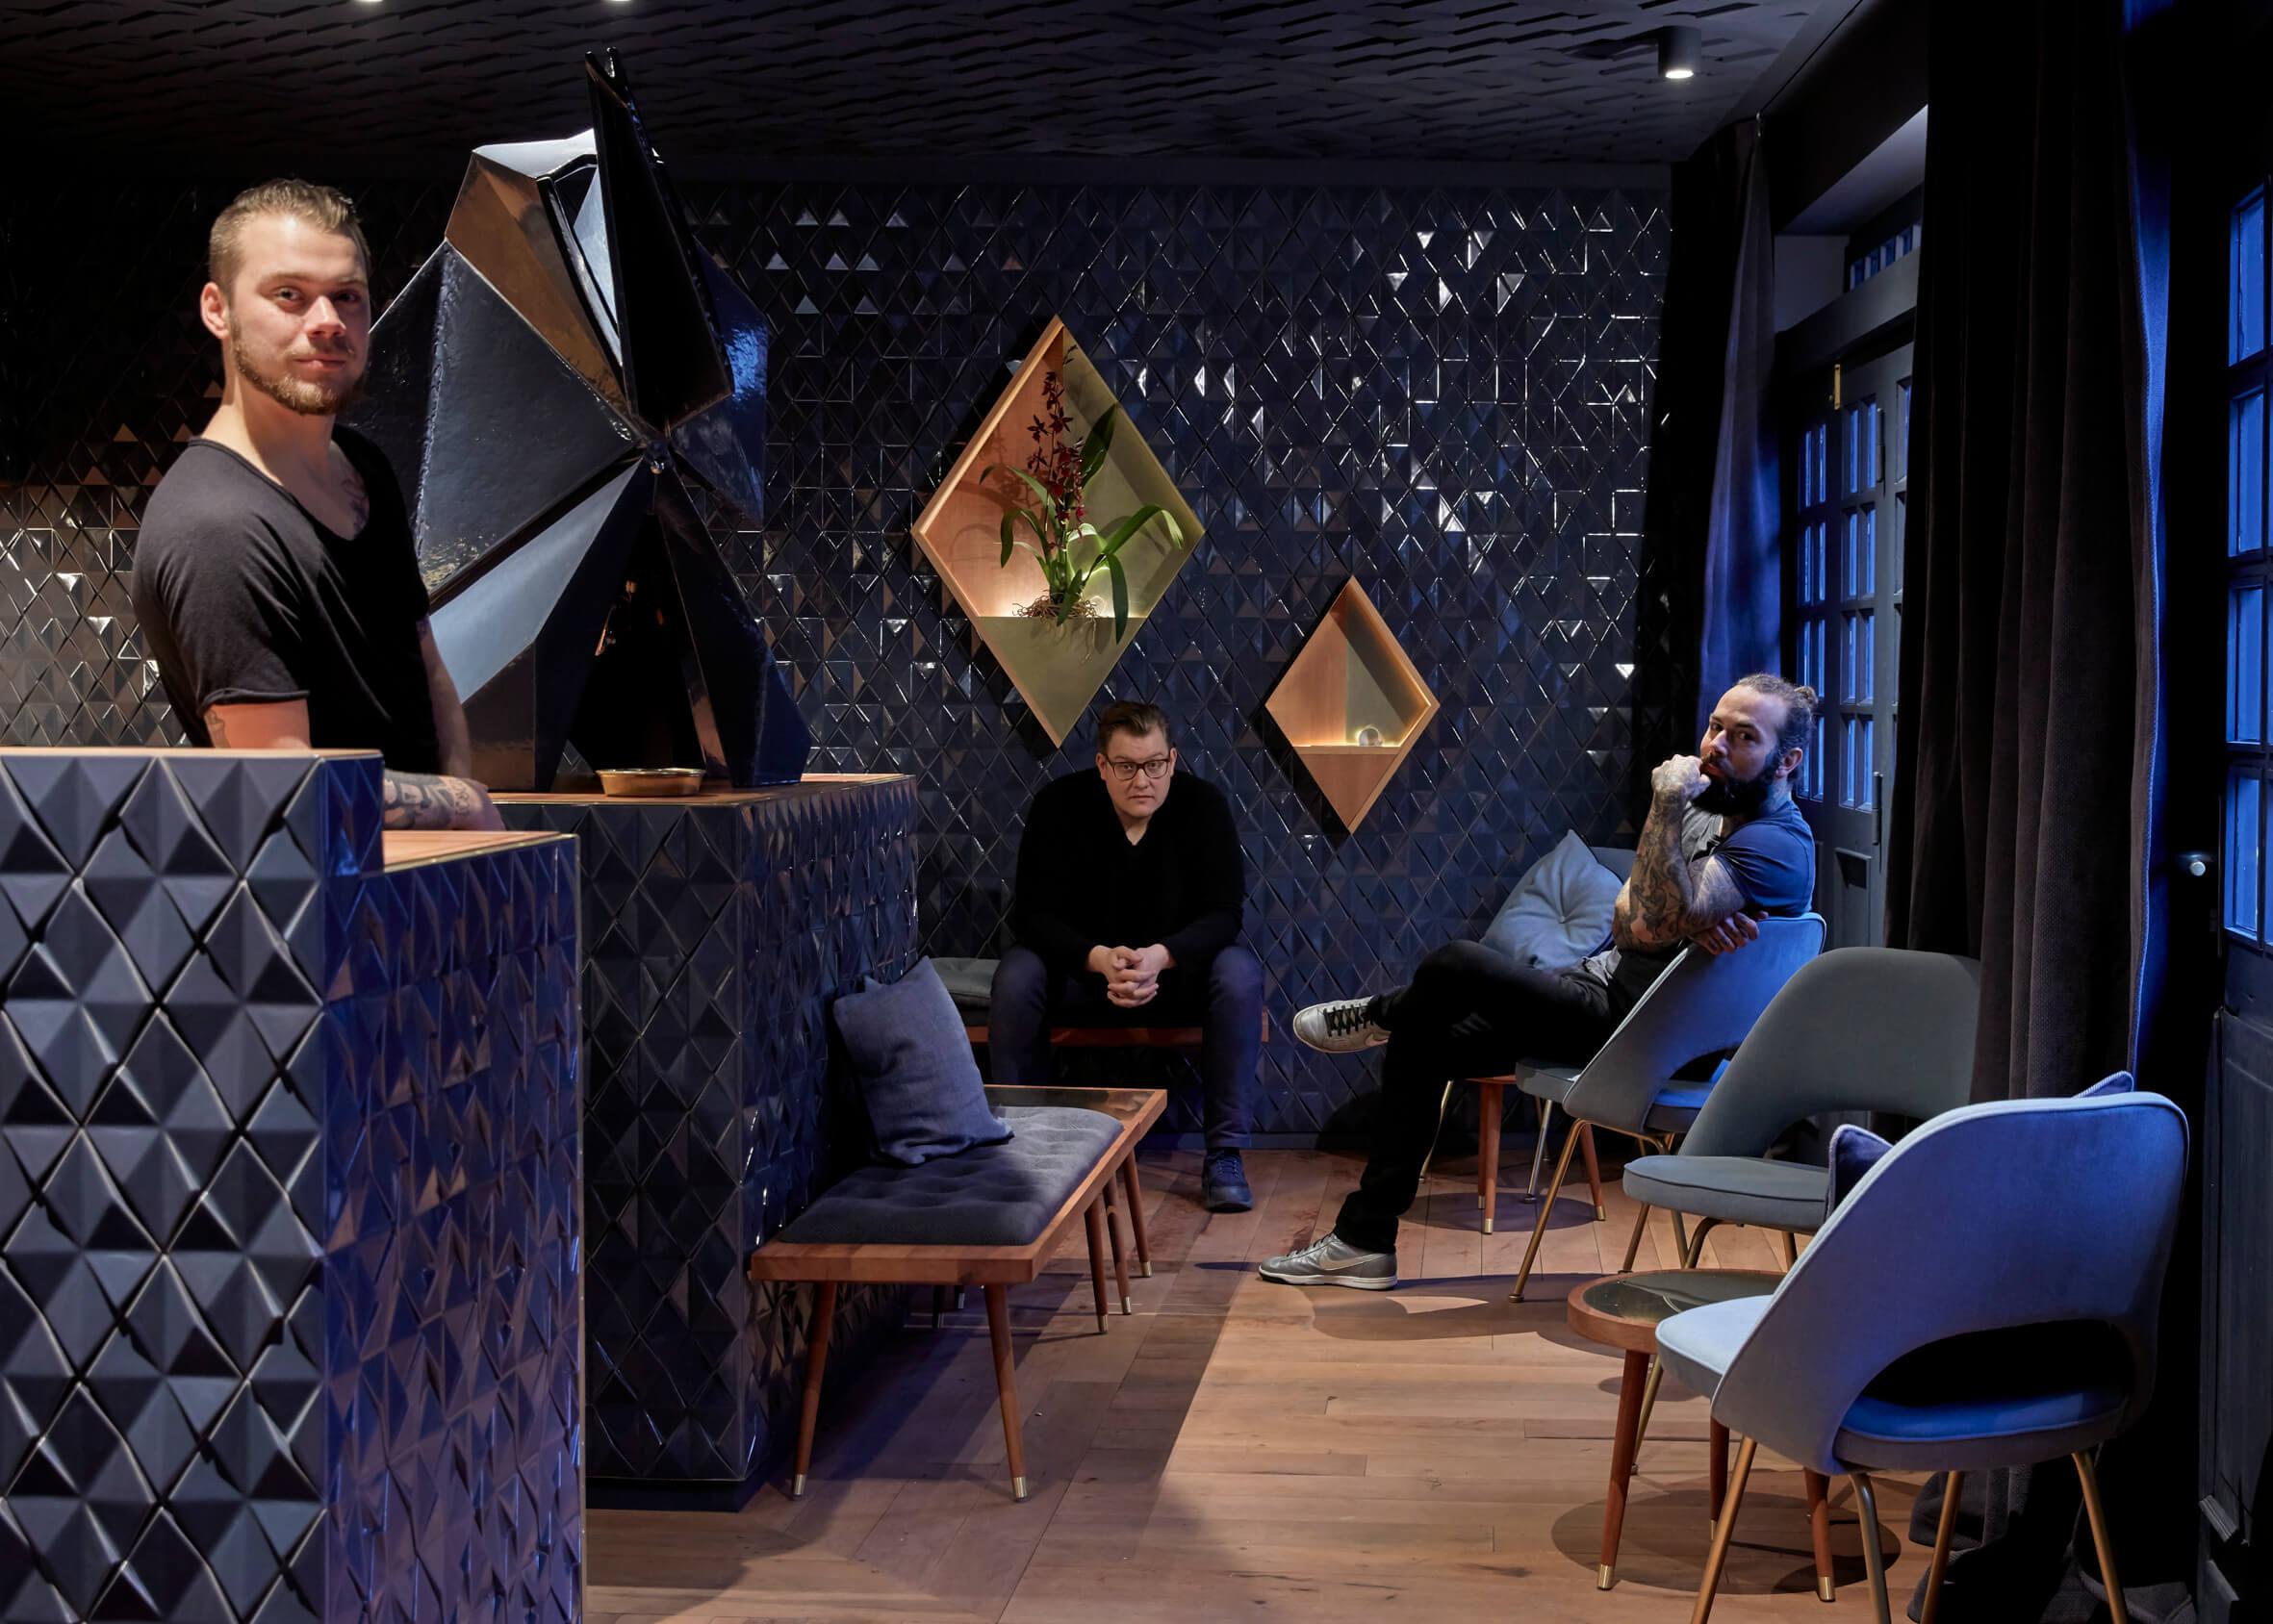 Einblick in die Bar Bonechina in Frankfurt